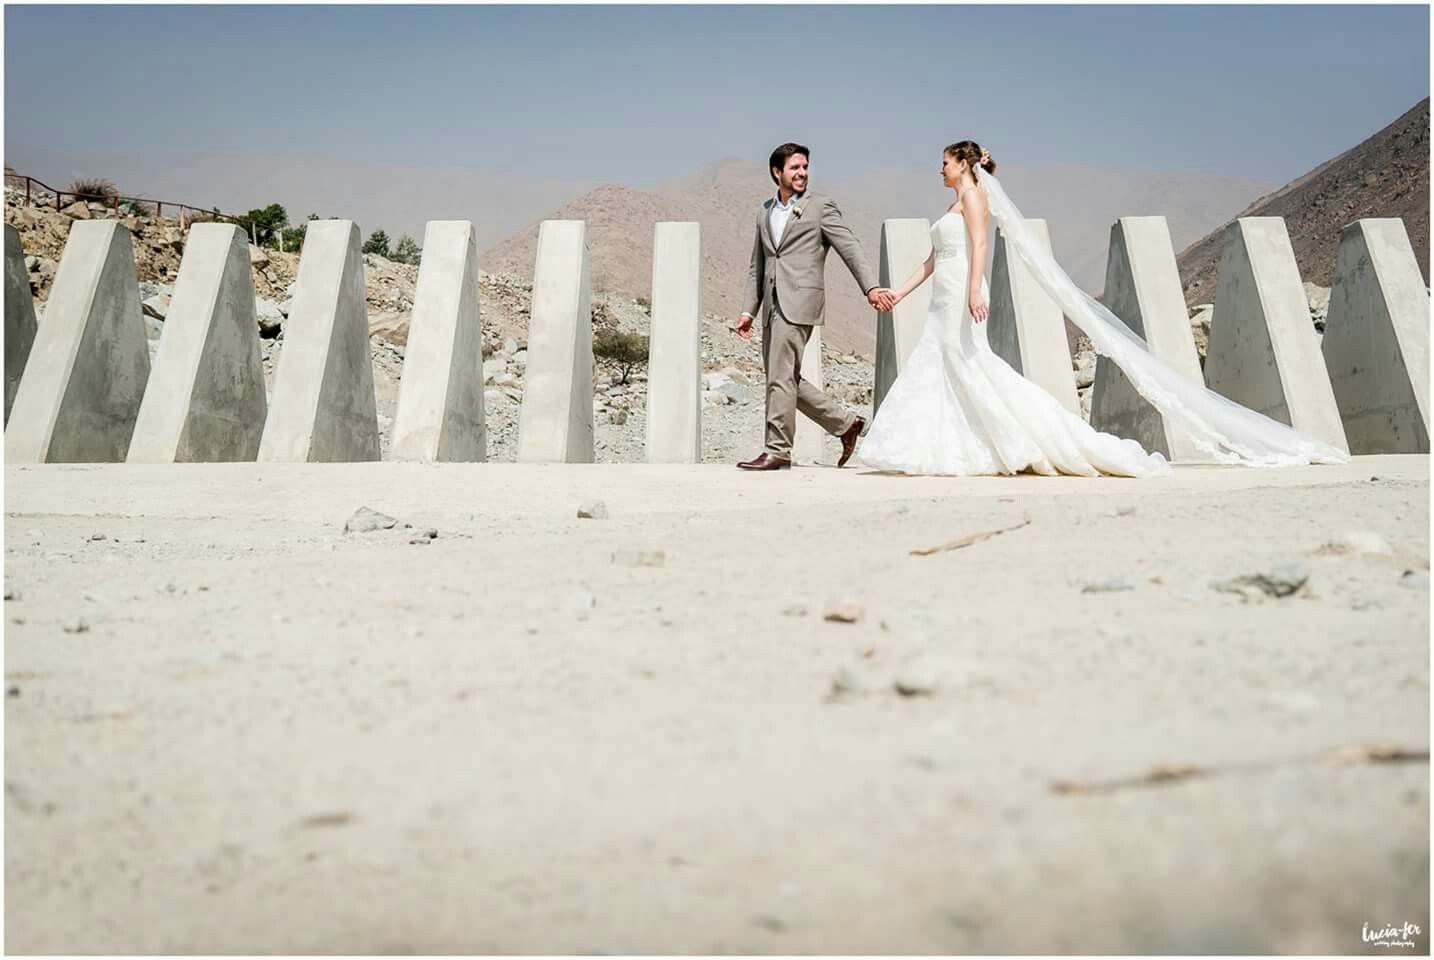 #boda #matrimonio #bride #groom #engagement #trashthedress #weddingphotography #wedding #justmarried #afterwedding #preboda #esession #love #luciaandfer